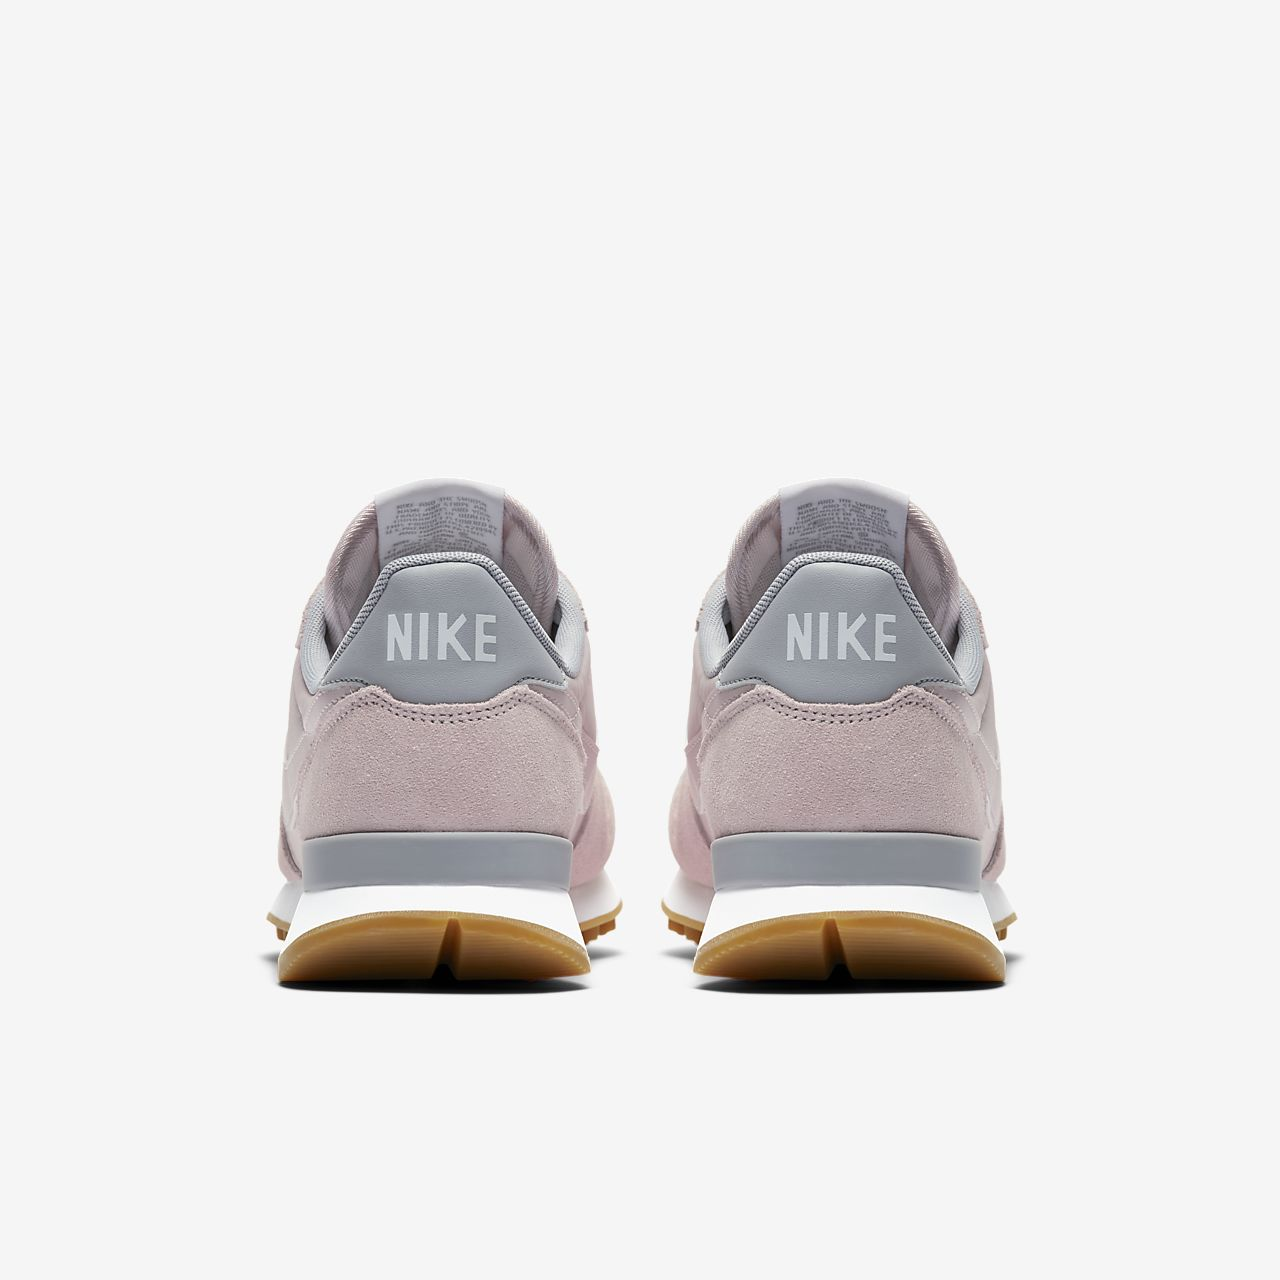 buy popular f0d80 07434 Low Resolution Nike Internationalist Womens Shoe Nike Internationalist  Womens Shoe